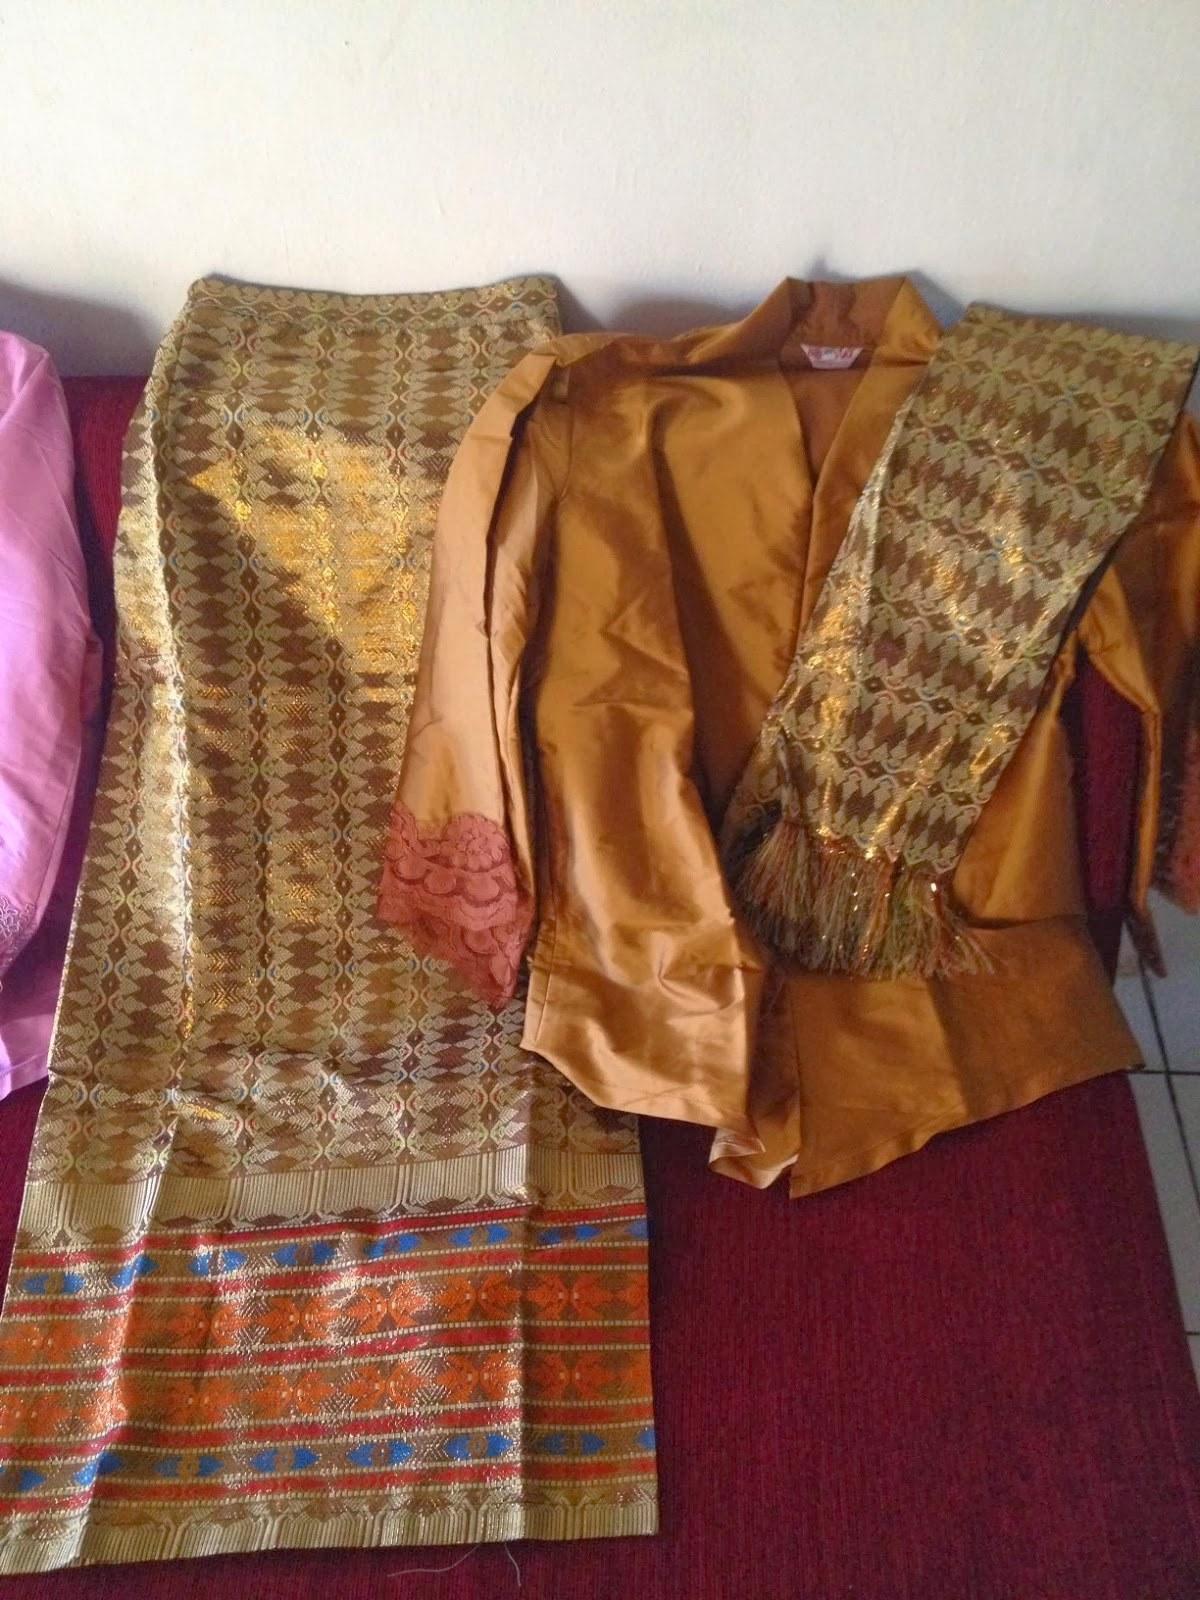 Inspirasi Model Baju Lebaran Di Thamrin City Etdg Kumpulan Foto Model Baju Kebaya Di Thamrin City Trend